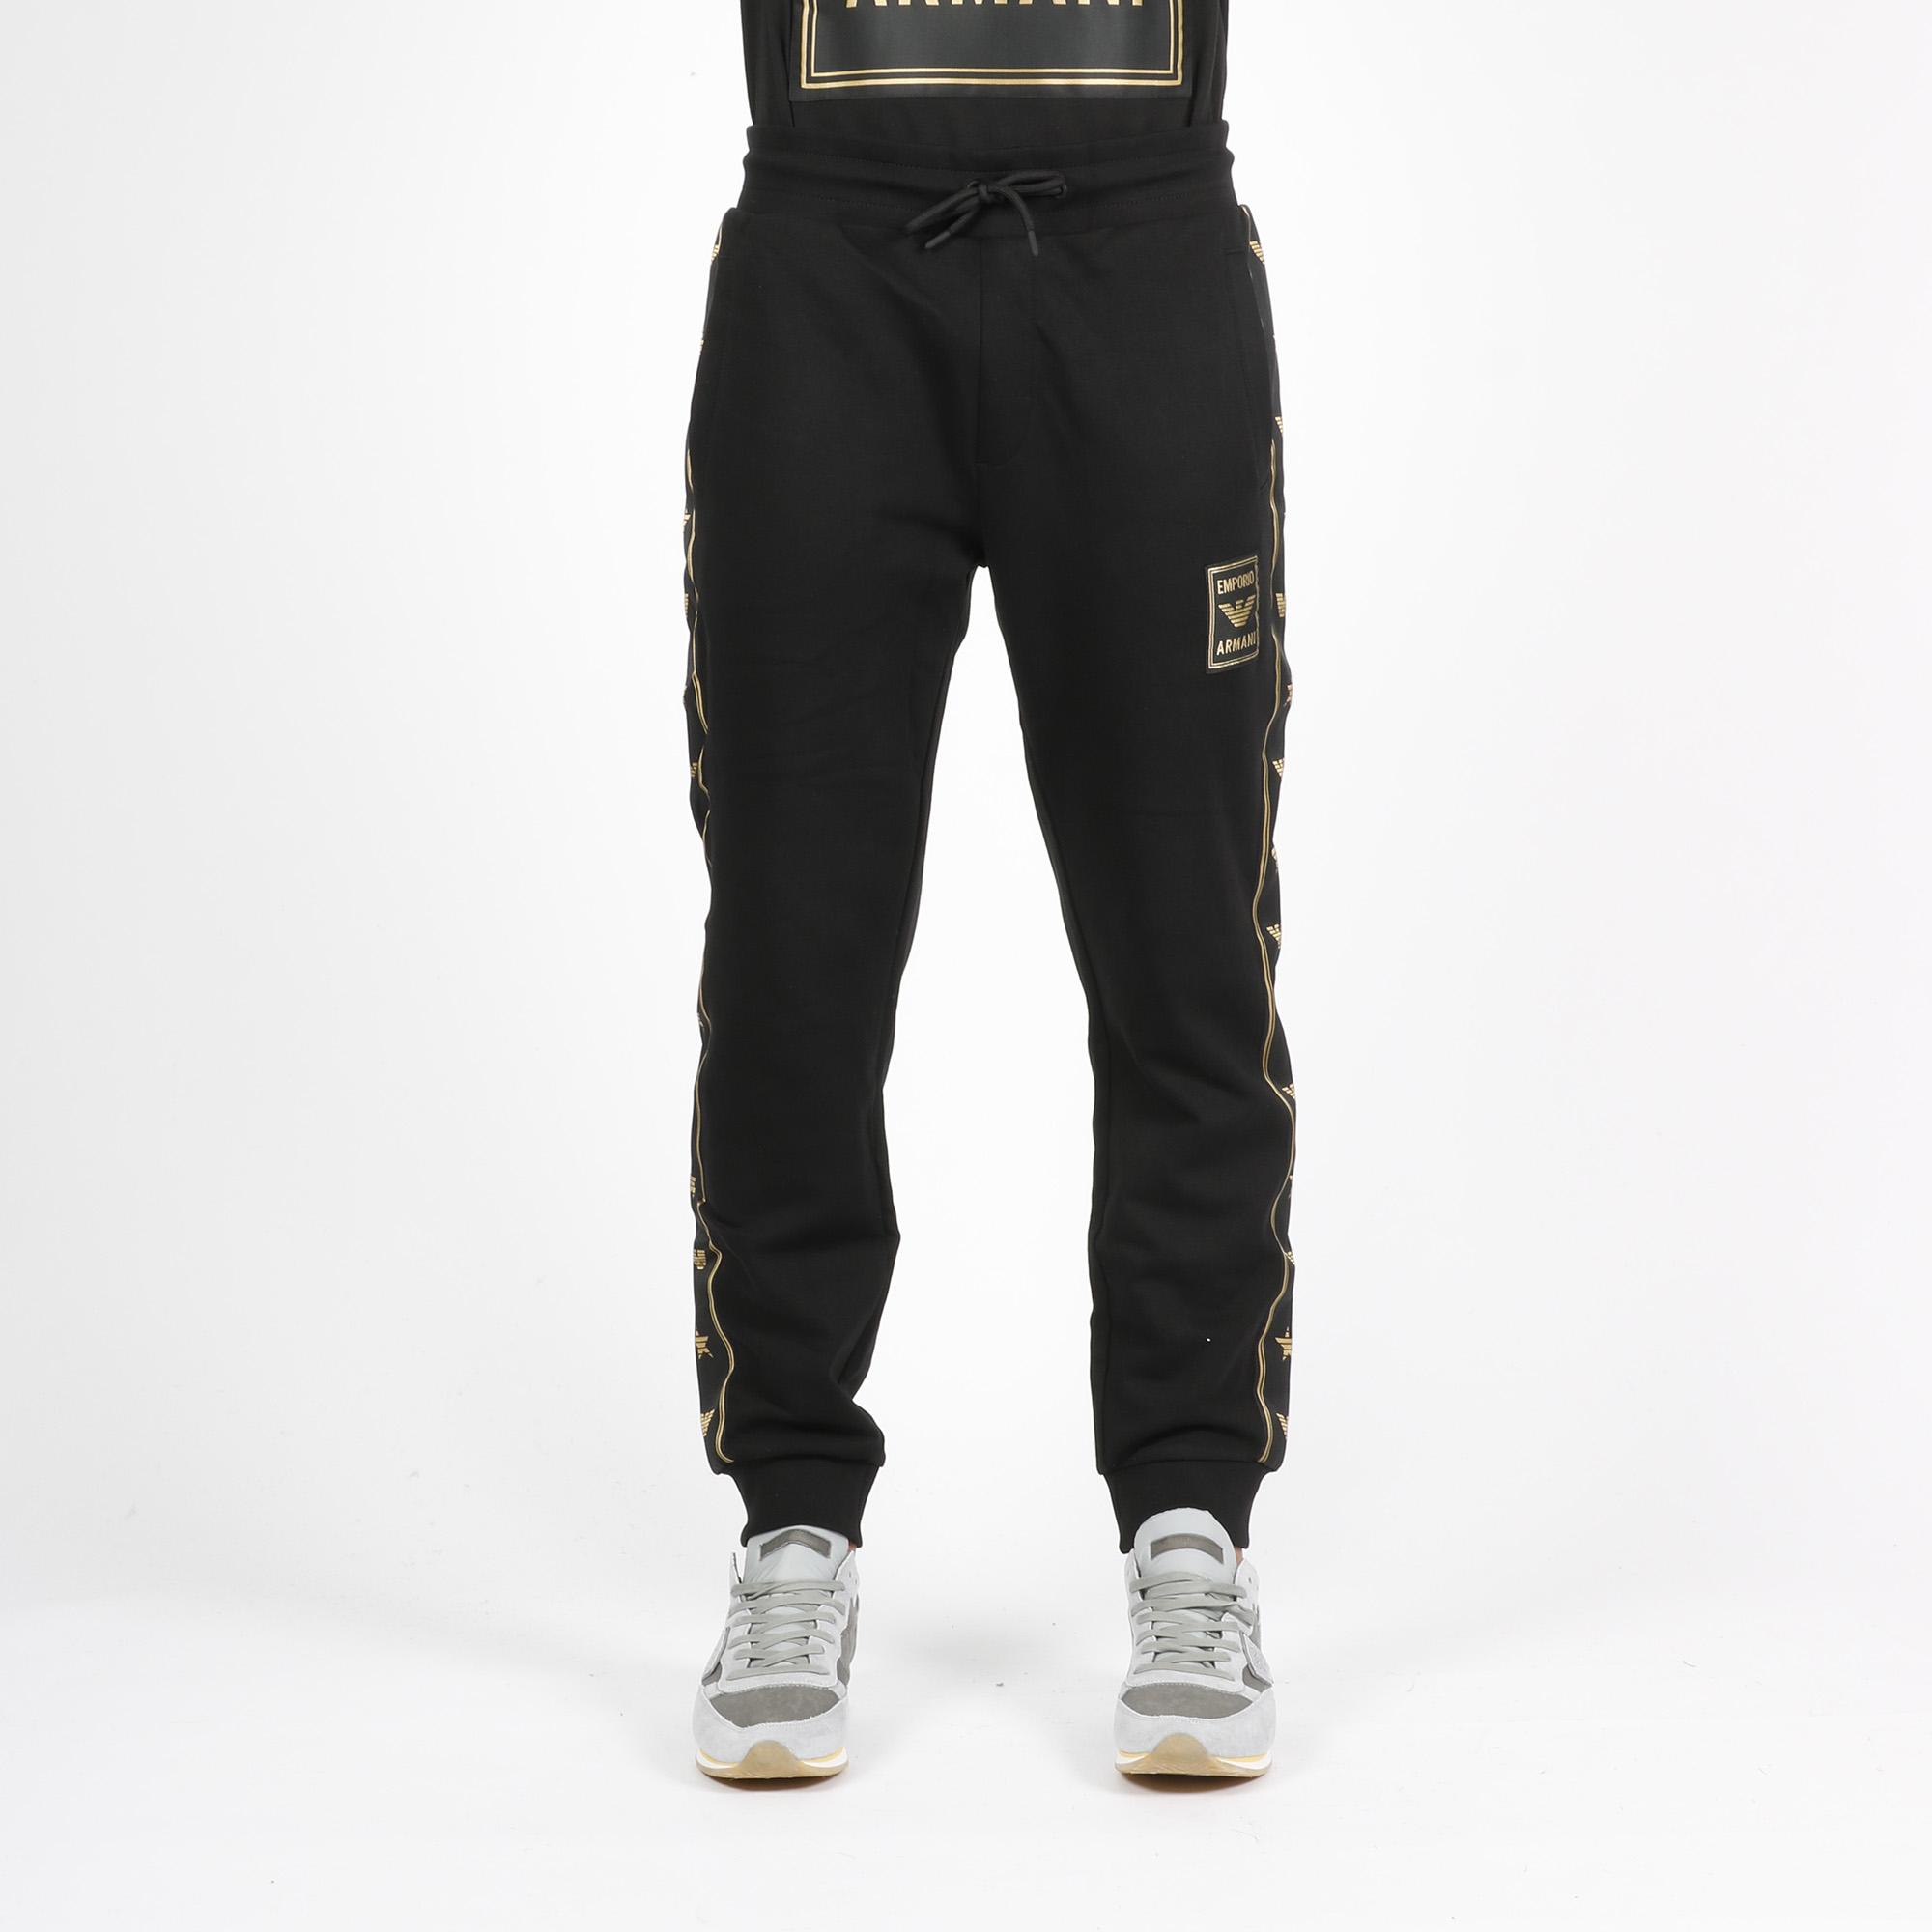 Pantalone tuta banda laterale logata - Nero/gold